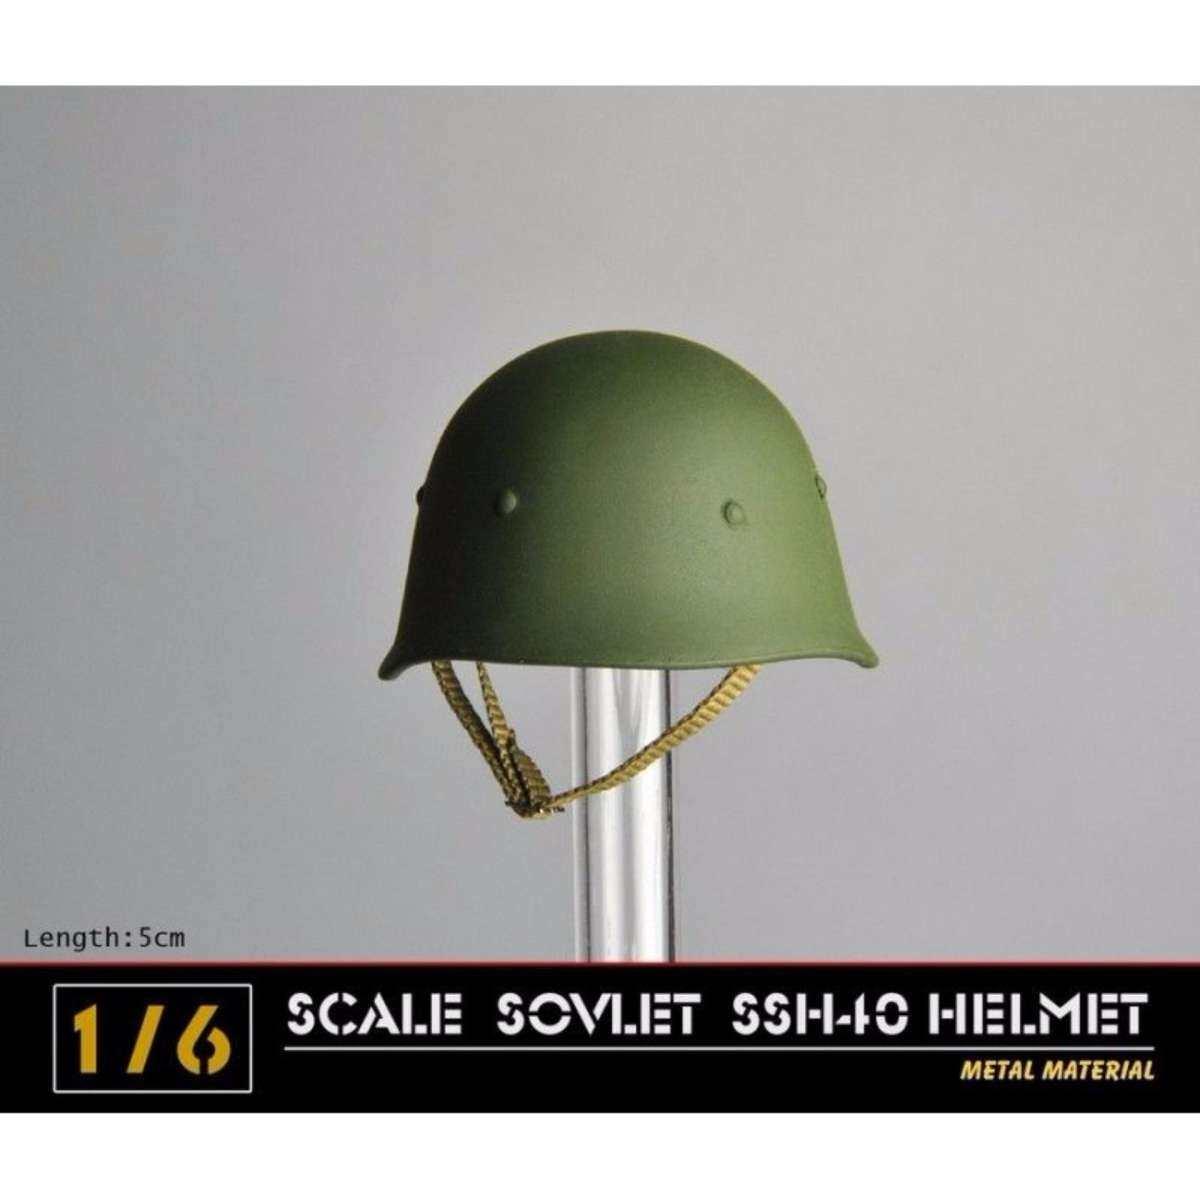 1/6 Perang Dunia II Soviet SSH40 Helm Logam Pria Topi Tentara Topi 12 & # X27 34 X27; Gambar